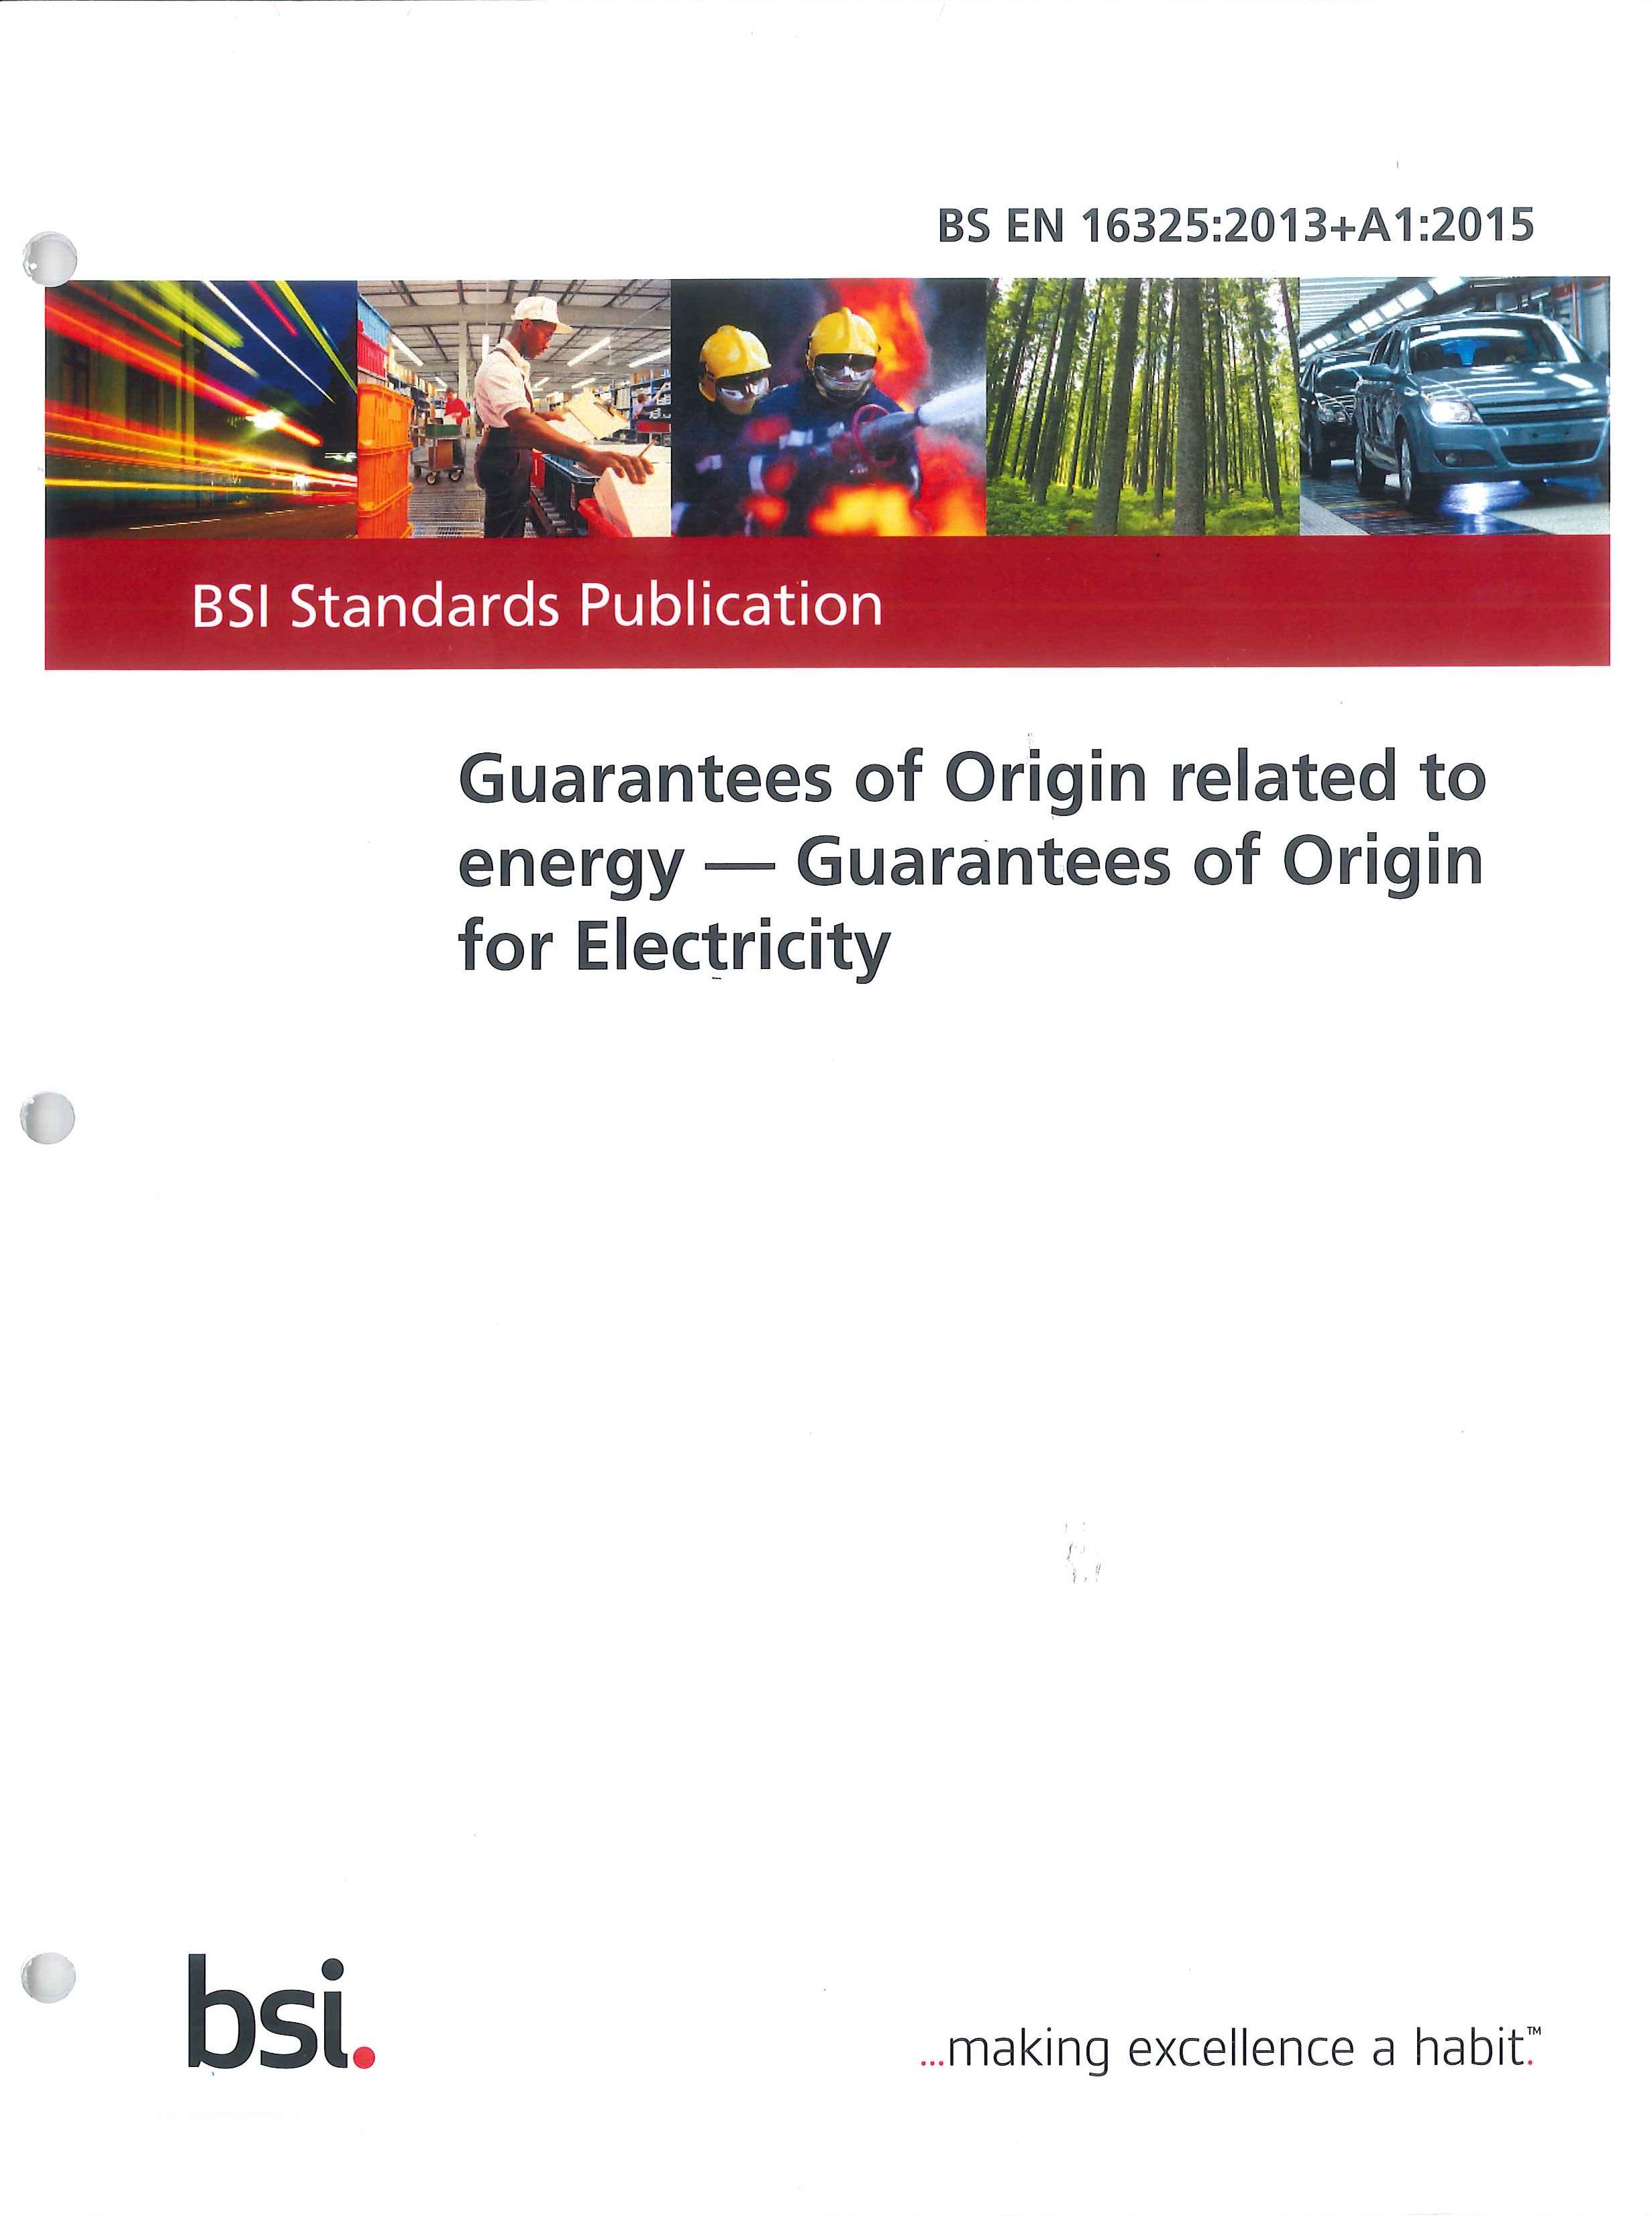 Guarantees of origin related to energy:guarantees of origin for electricity